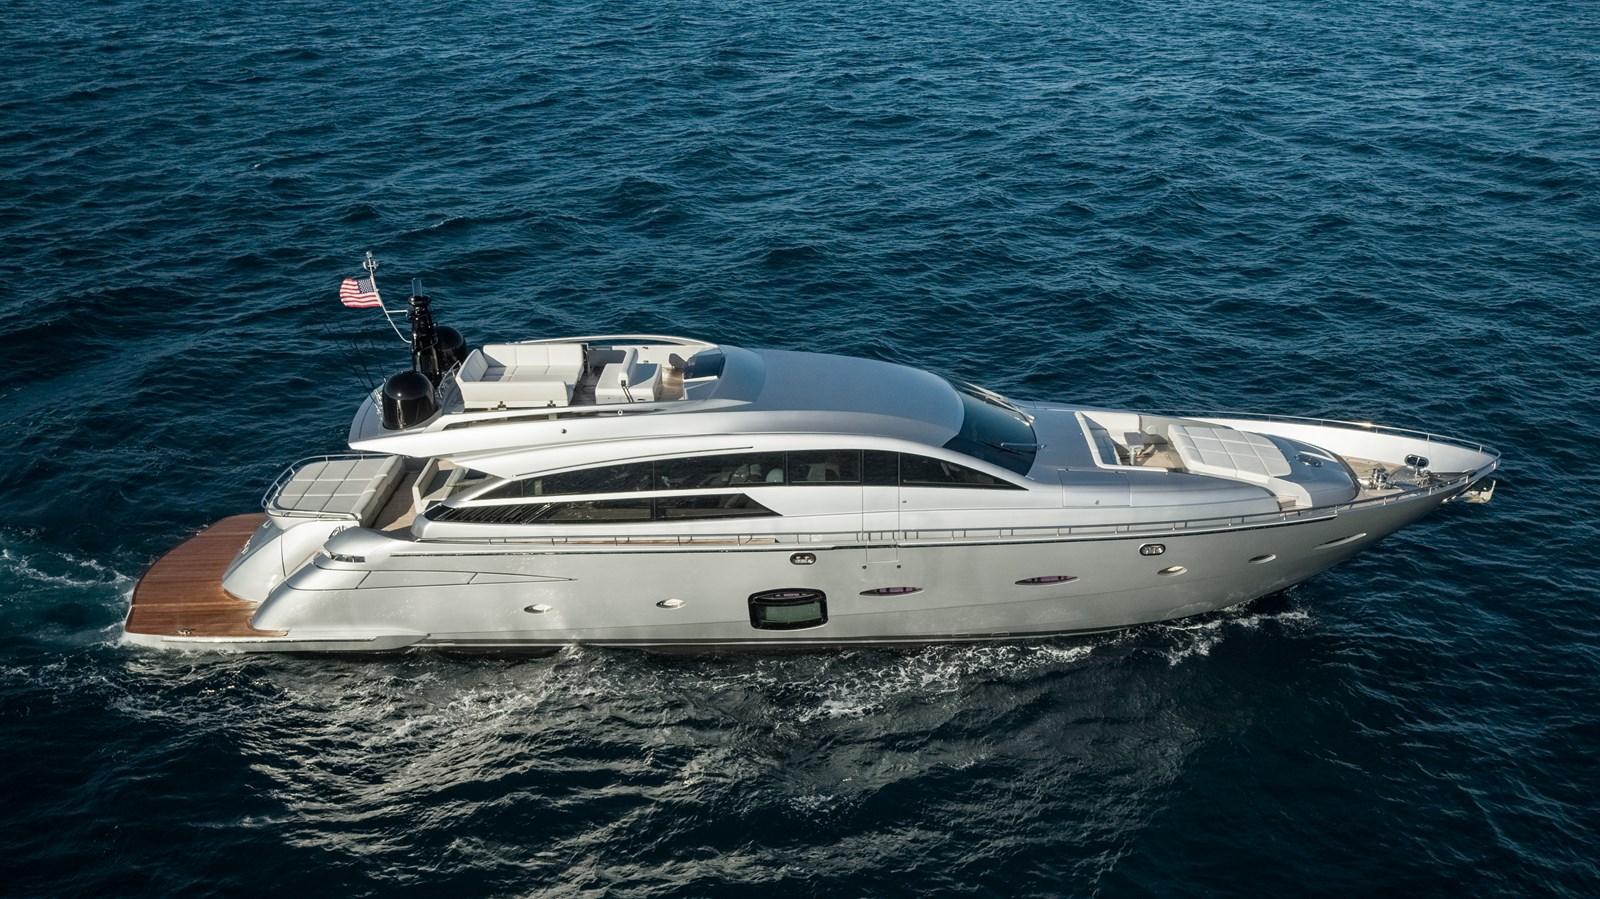 DJI_0020 2012 PERSHING  Motor Yacht 2810226